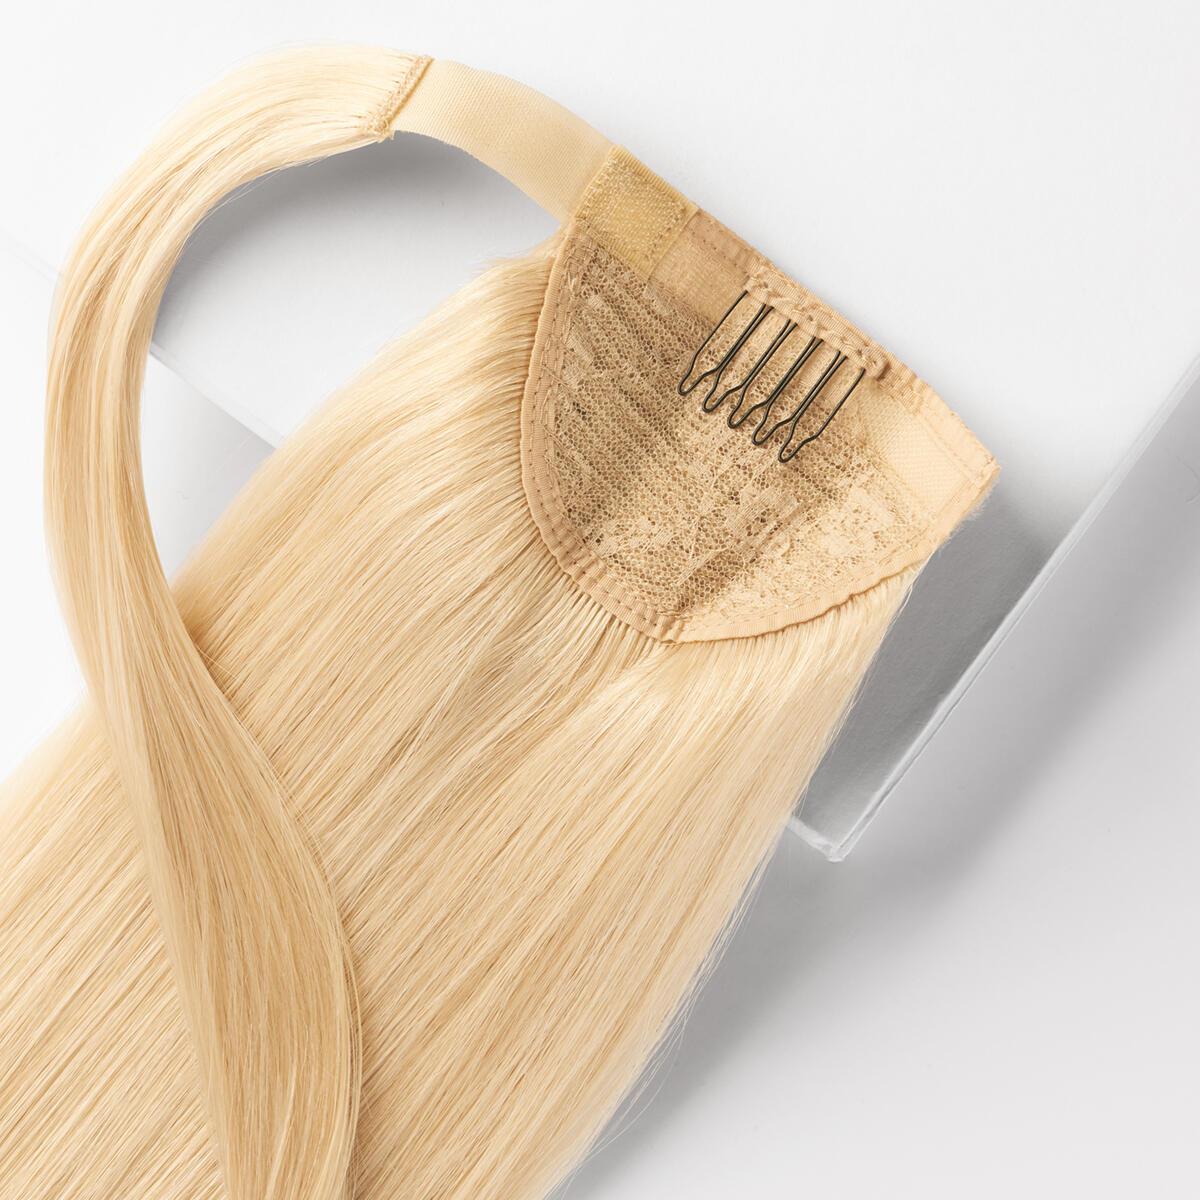 Clip-in Ponytail 10.8 Light Blonde 30 cm